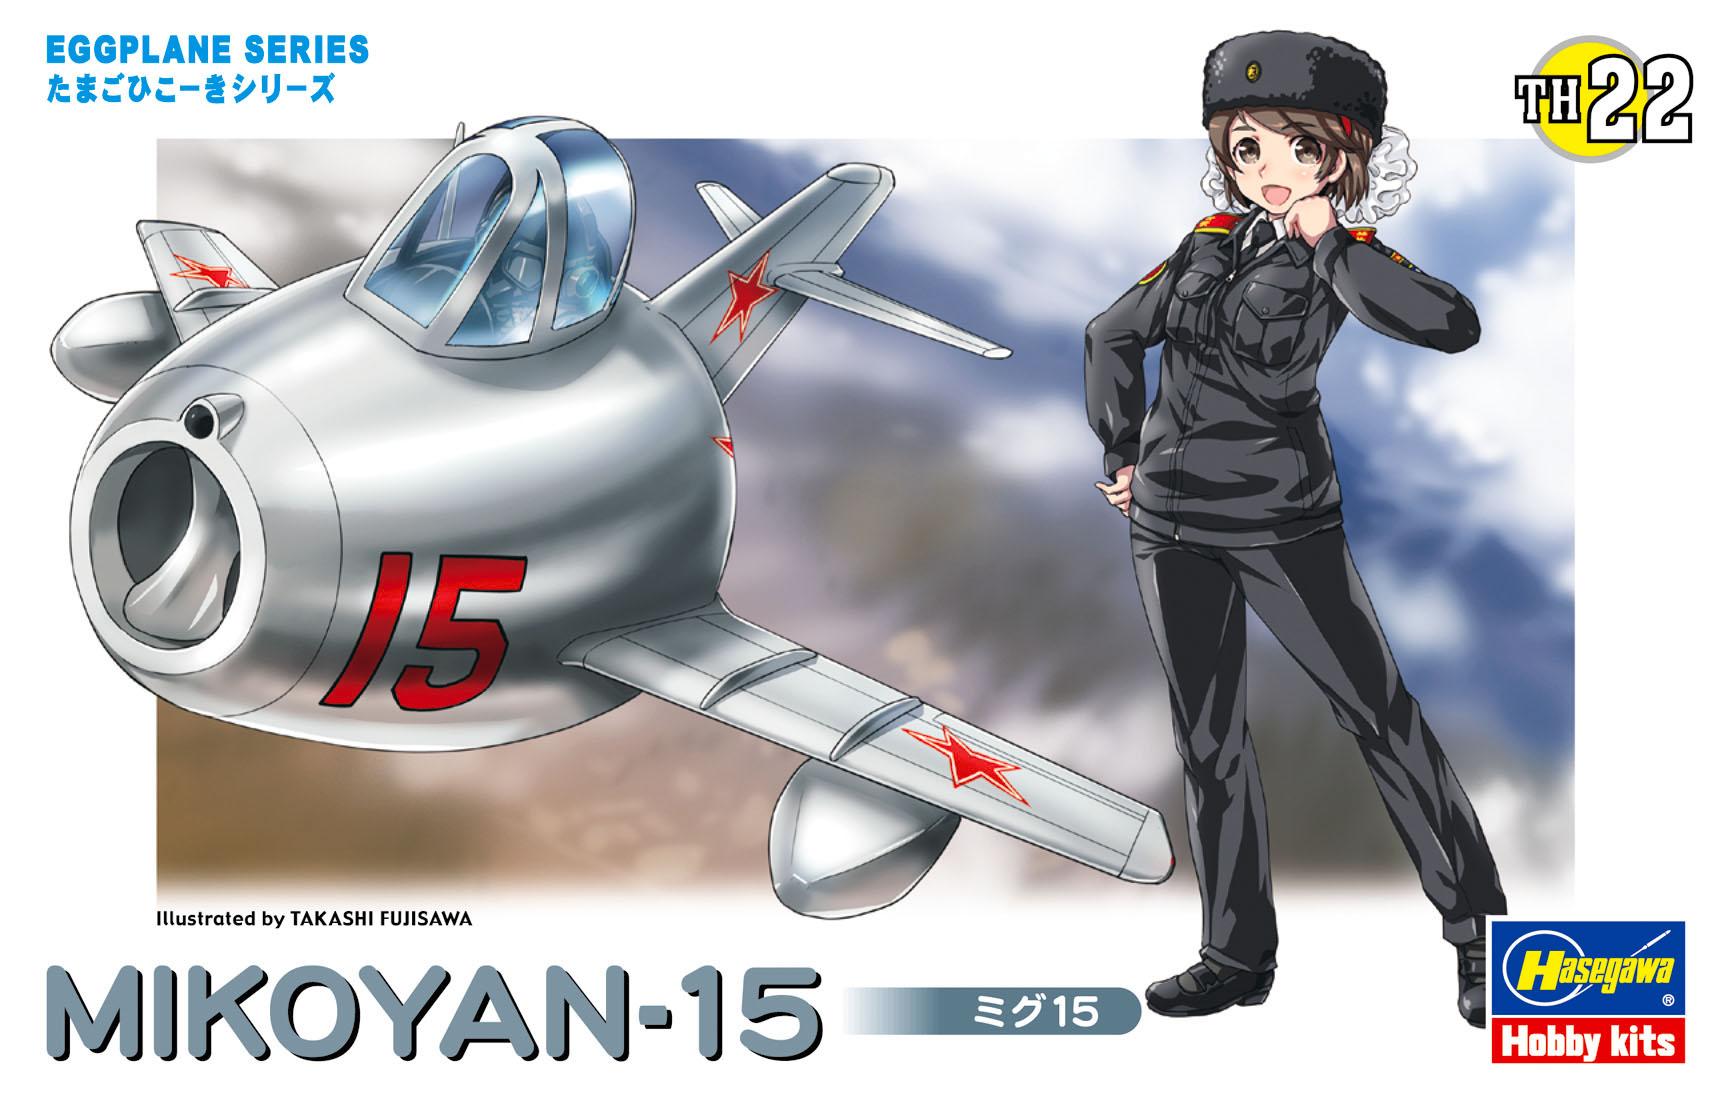 Hasegawa Egg Plane Mikoyan-15